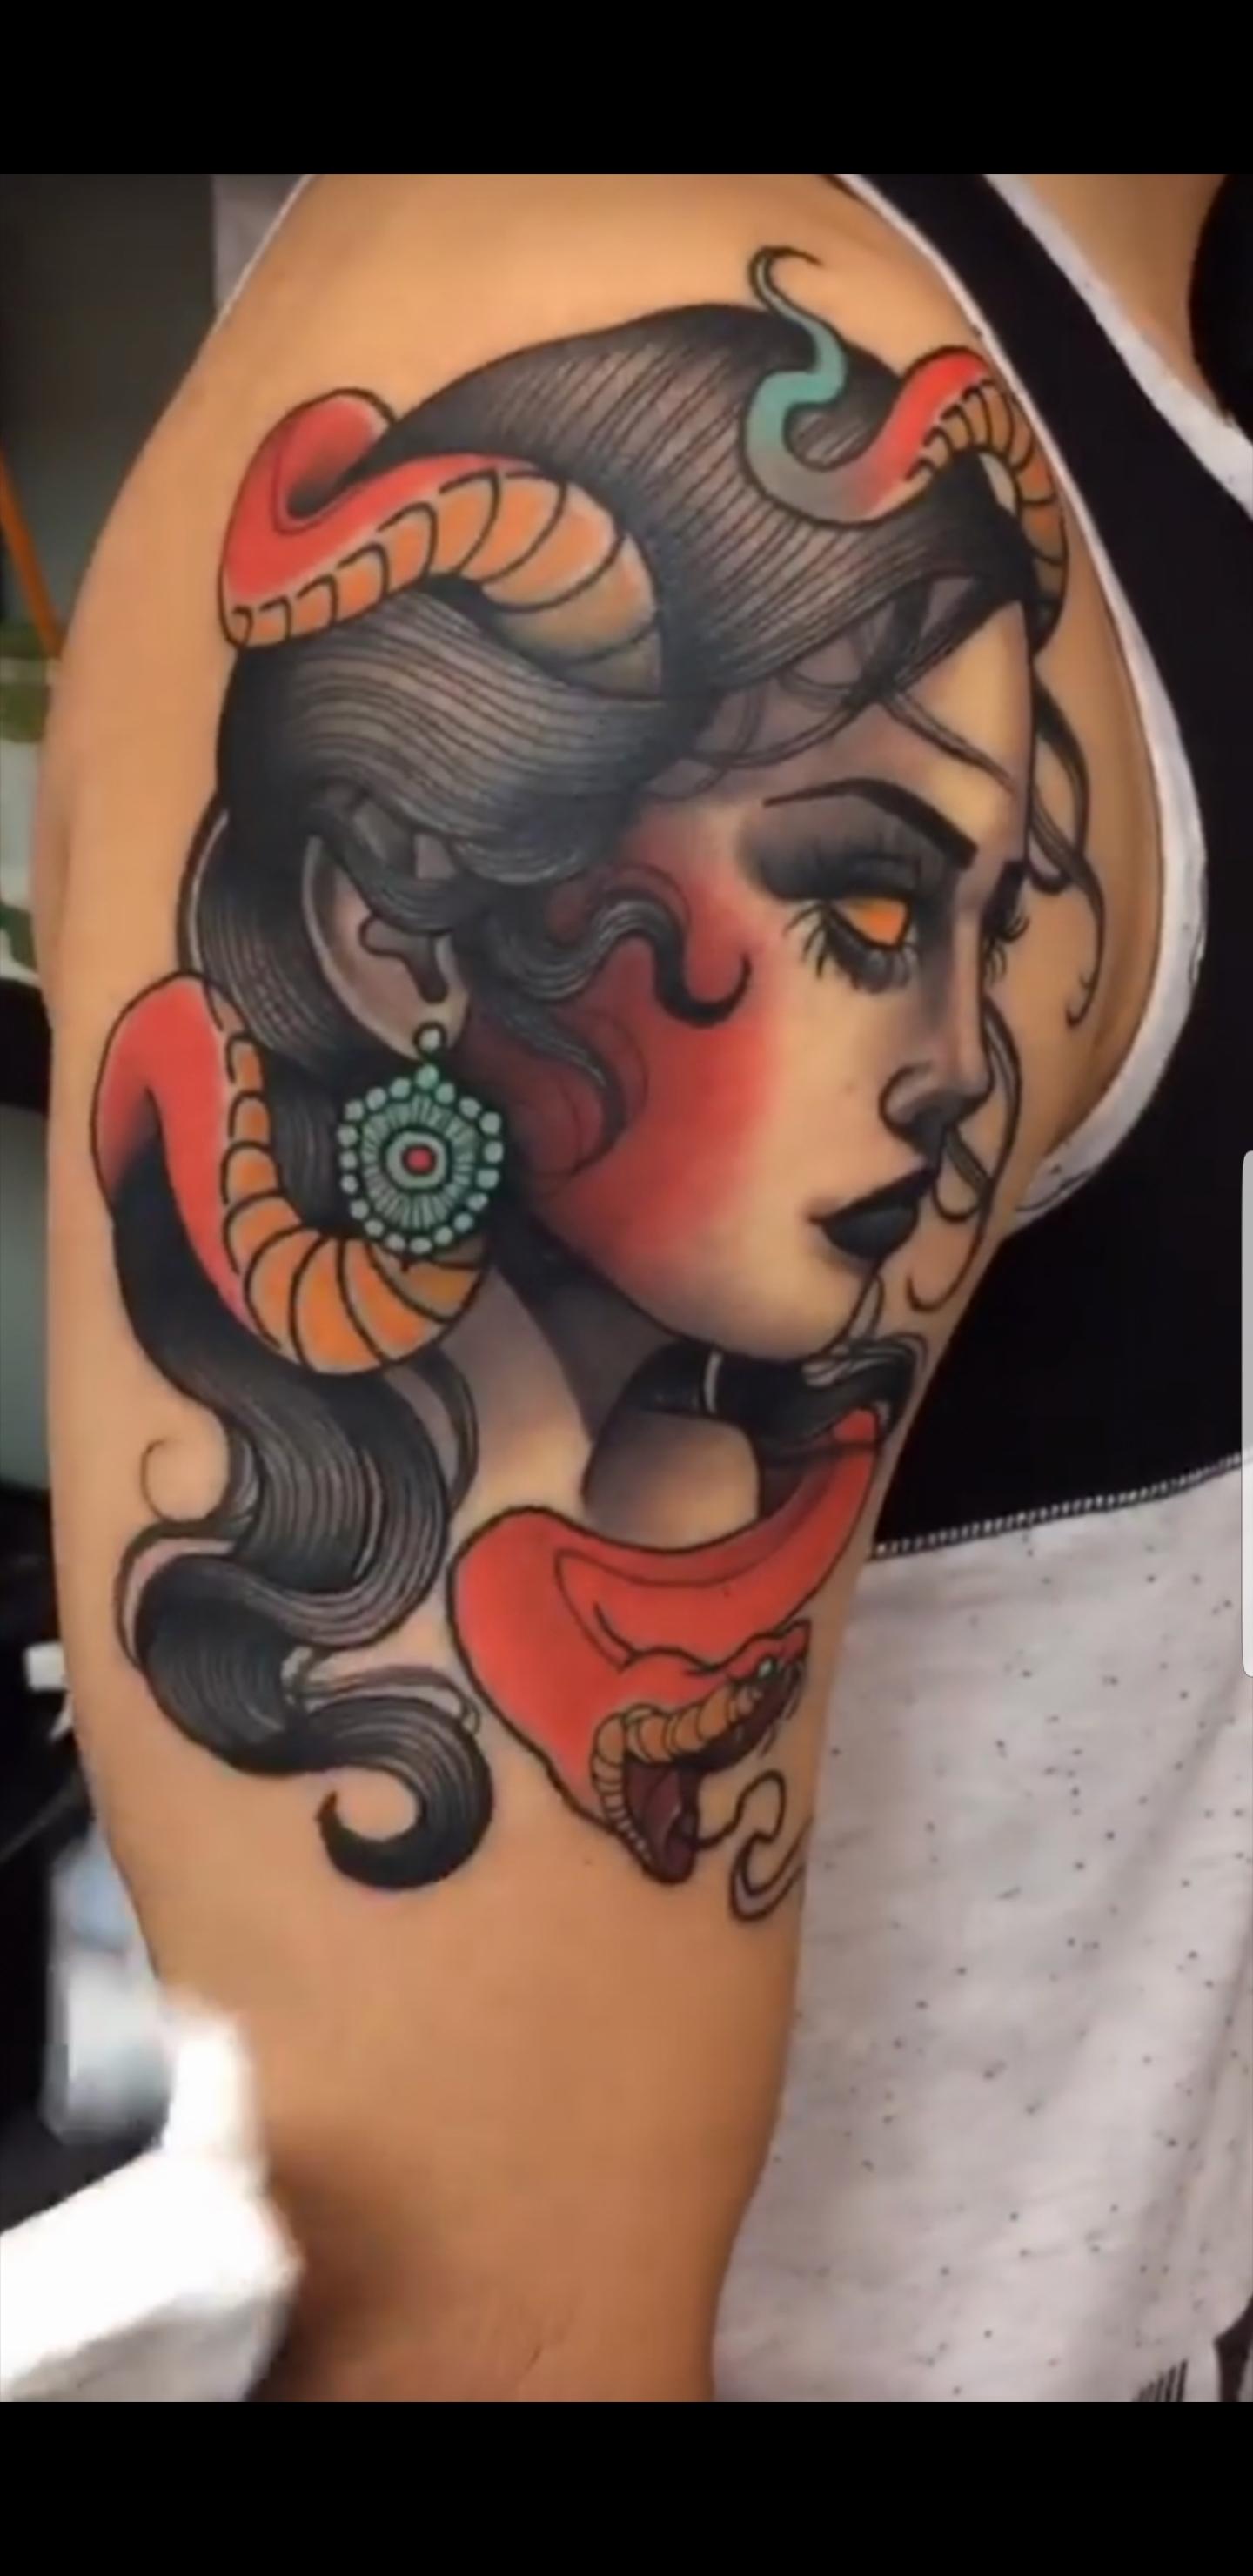 Red Dagger Tattoo : dagger, tattoo, Abel_av, Dagger, Tattoo, Houston, Tattoos